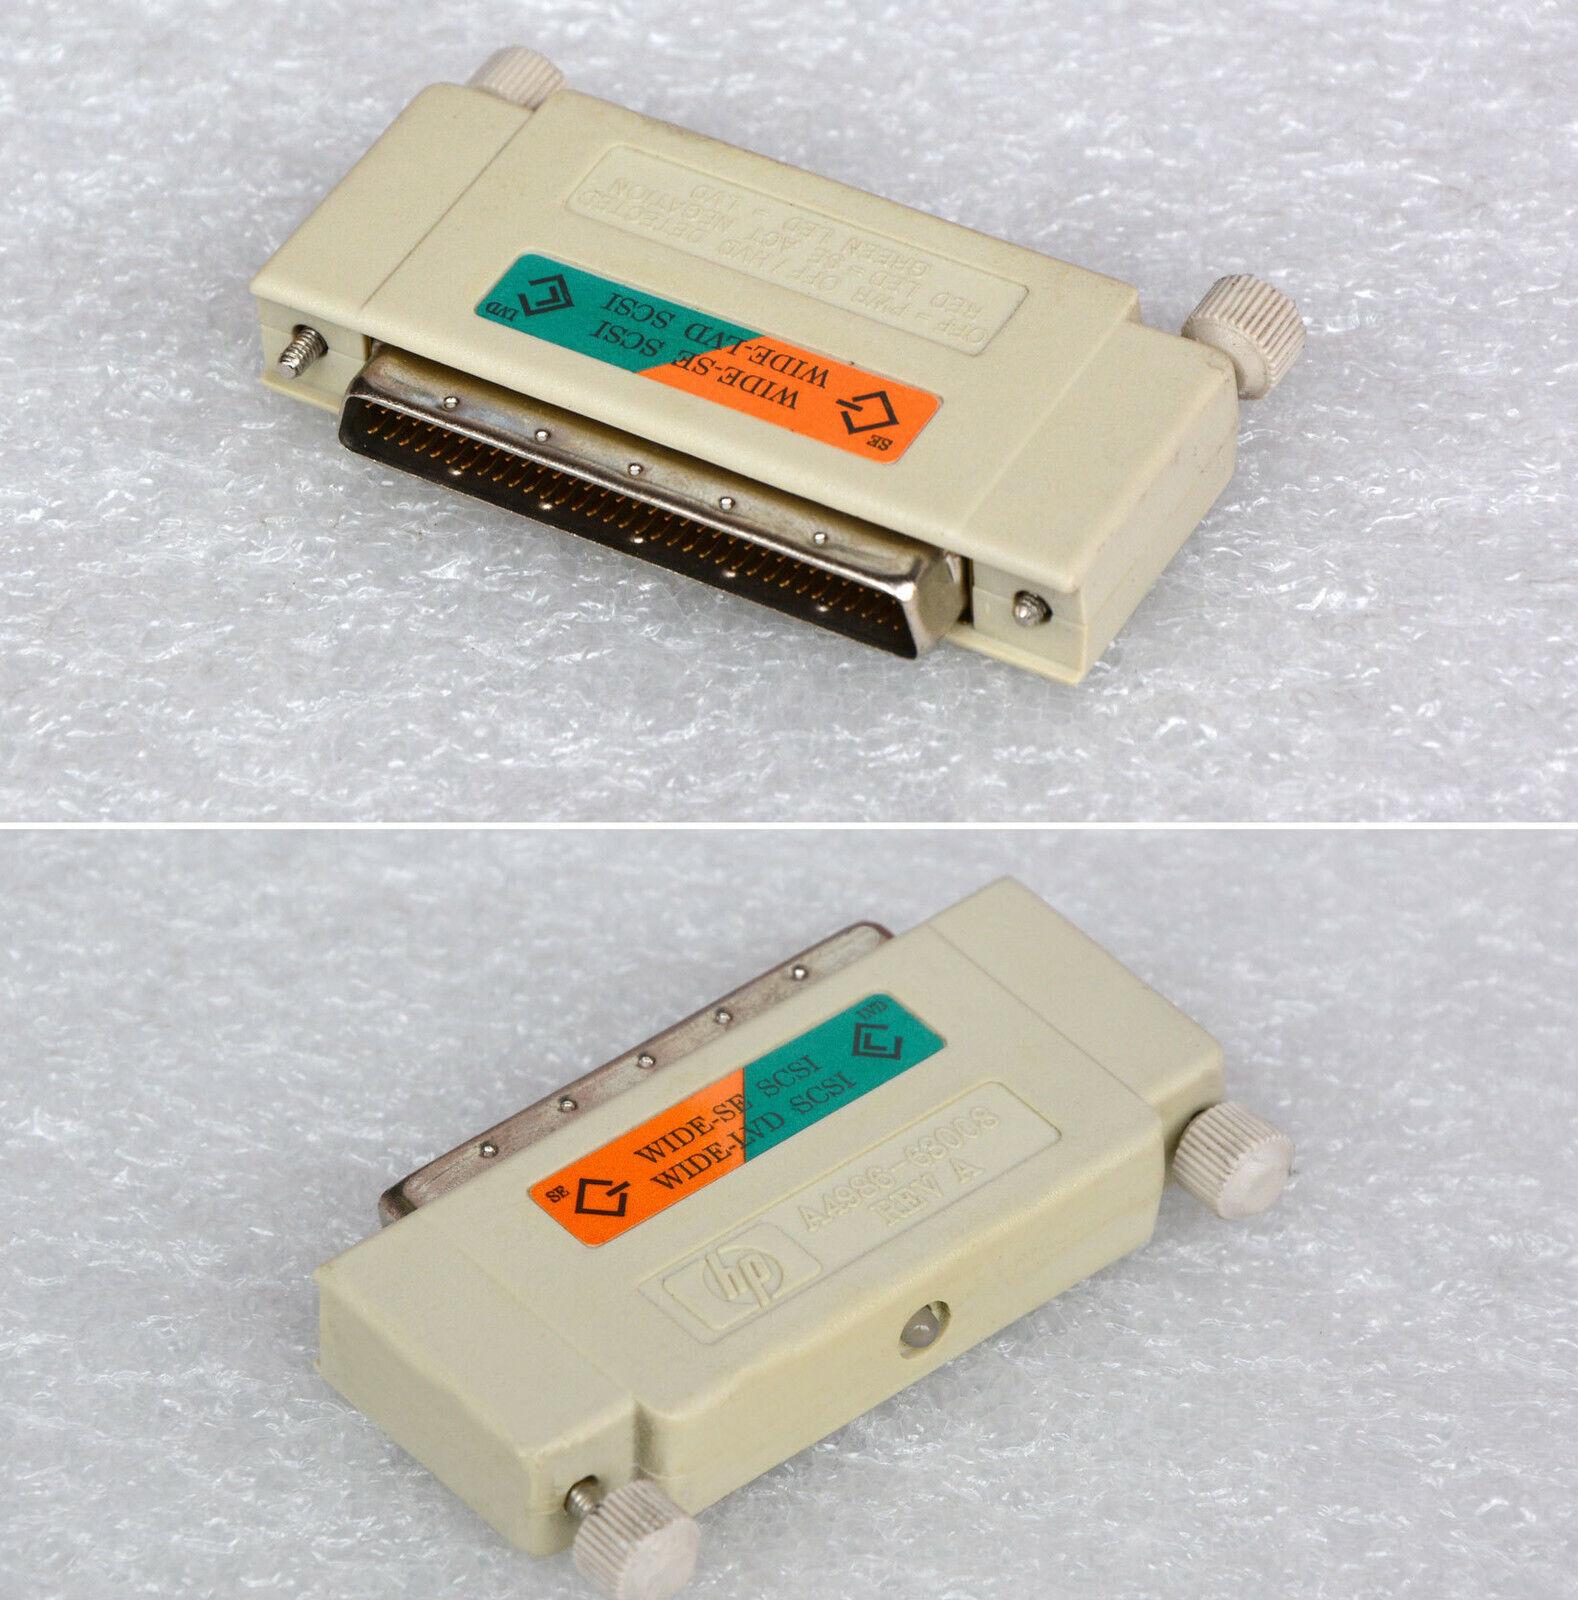 SCSI Others Ultrawide Terminator Lvd/Se HP A4986-63008 68PIN 68POL Jack-Plug #